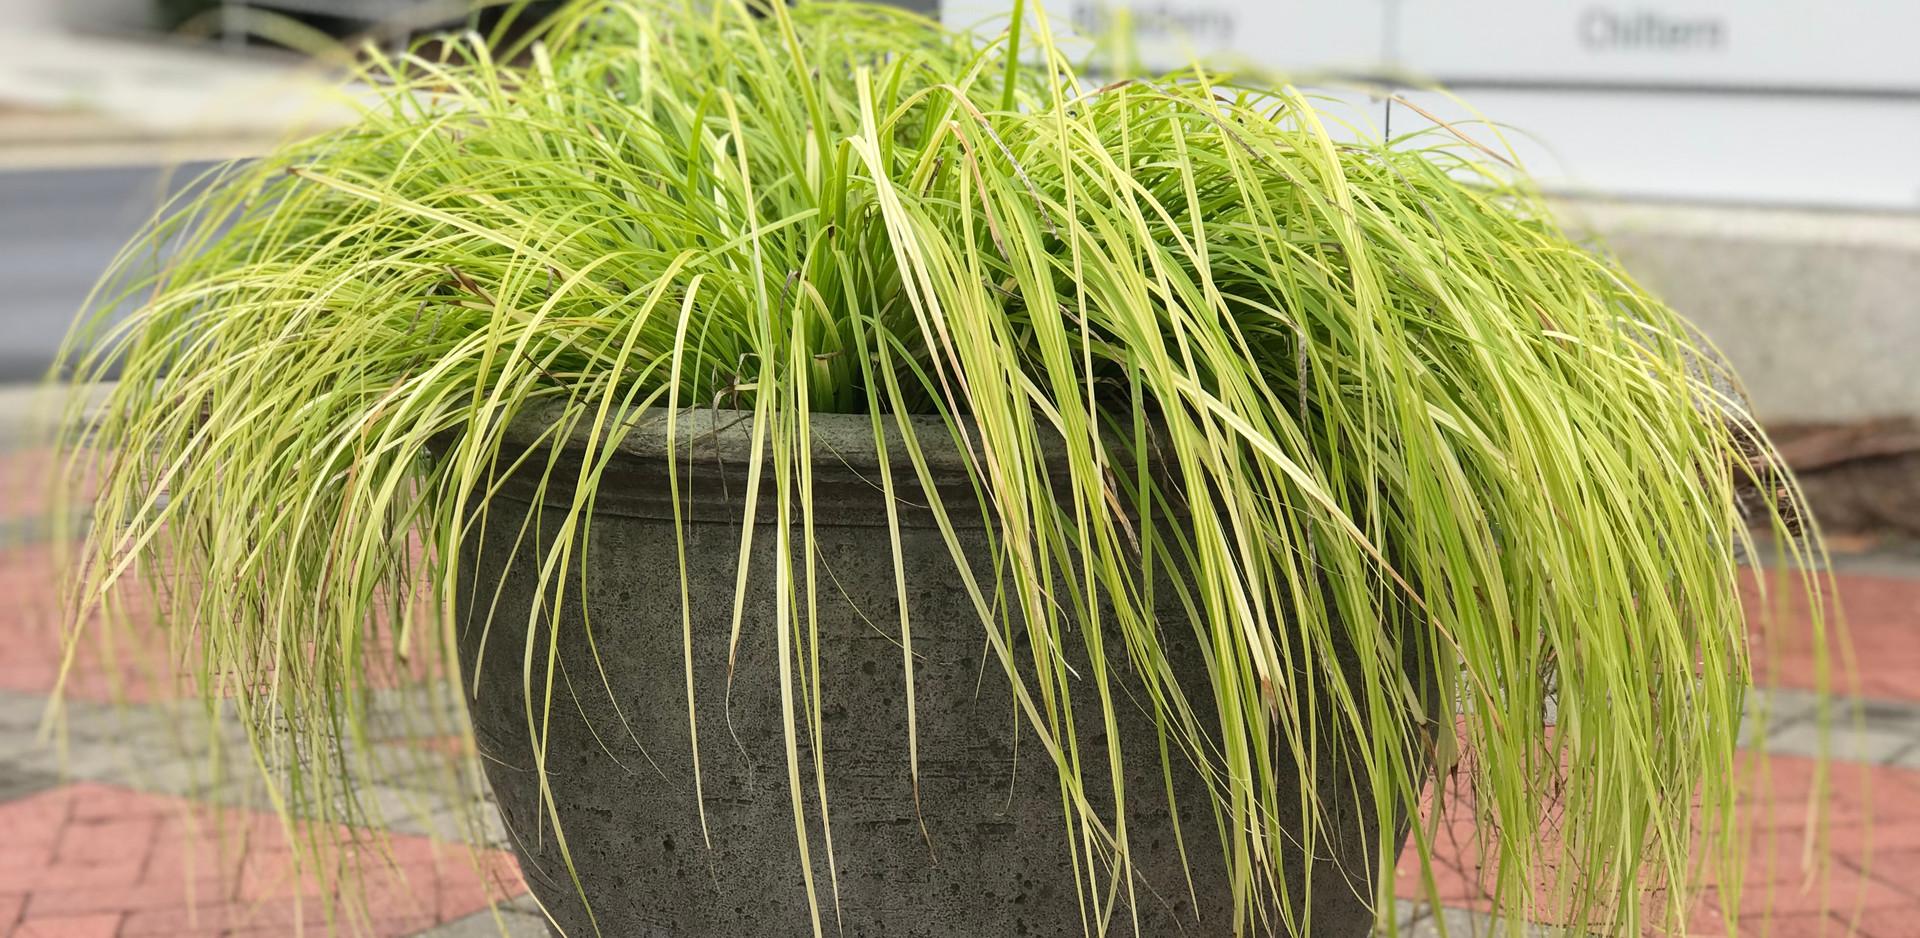 Centregreen - Carex Conversion